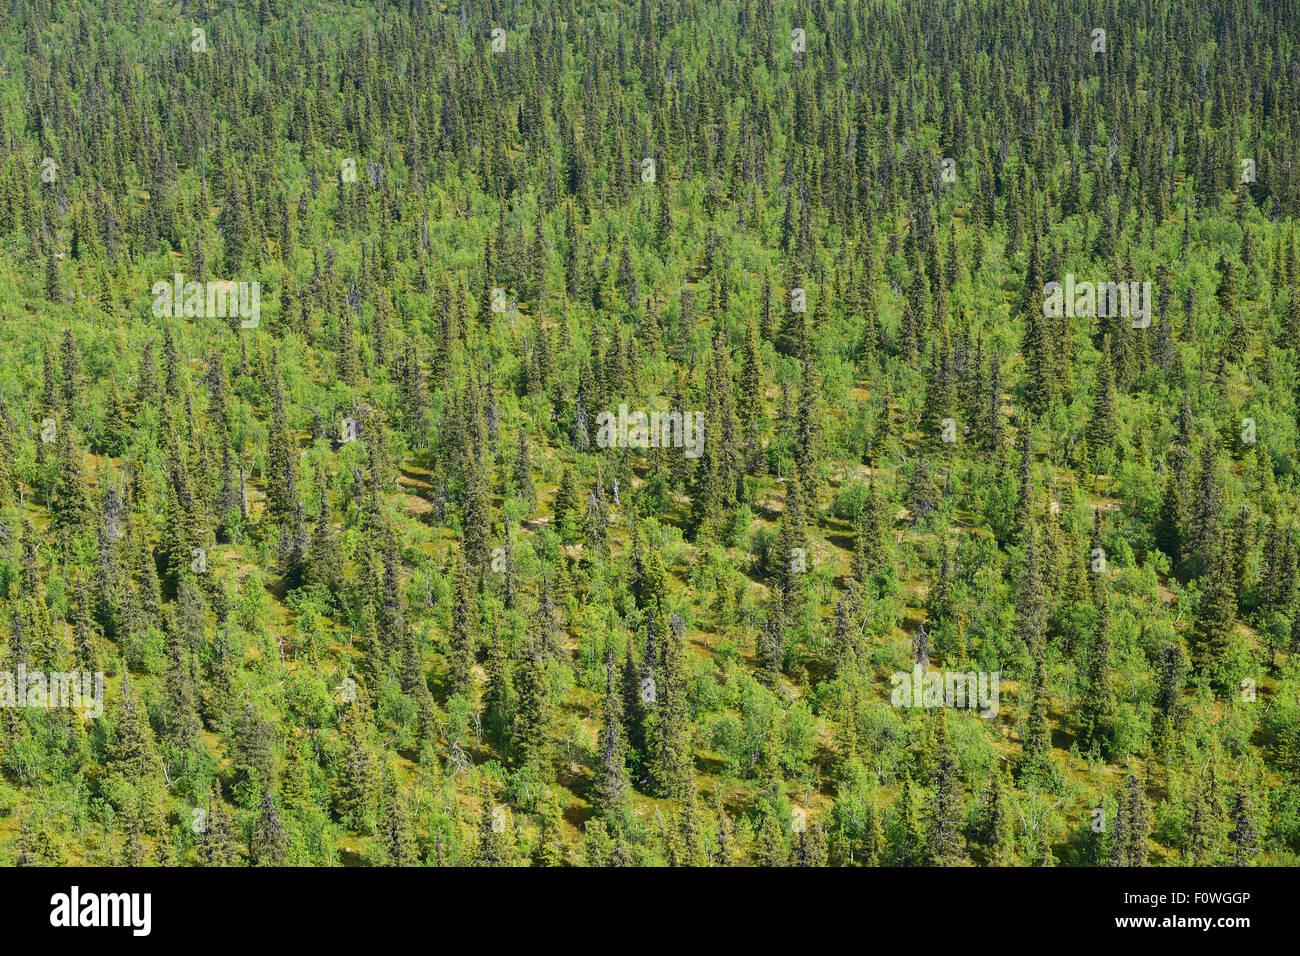 Aerial view of taiga boreal forest, Sjaunja Bird Protection Area ...